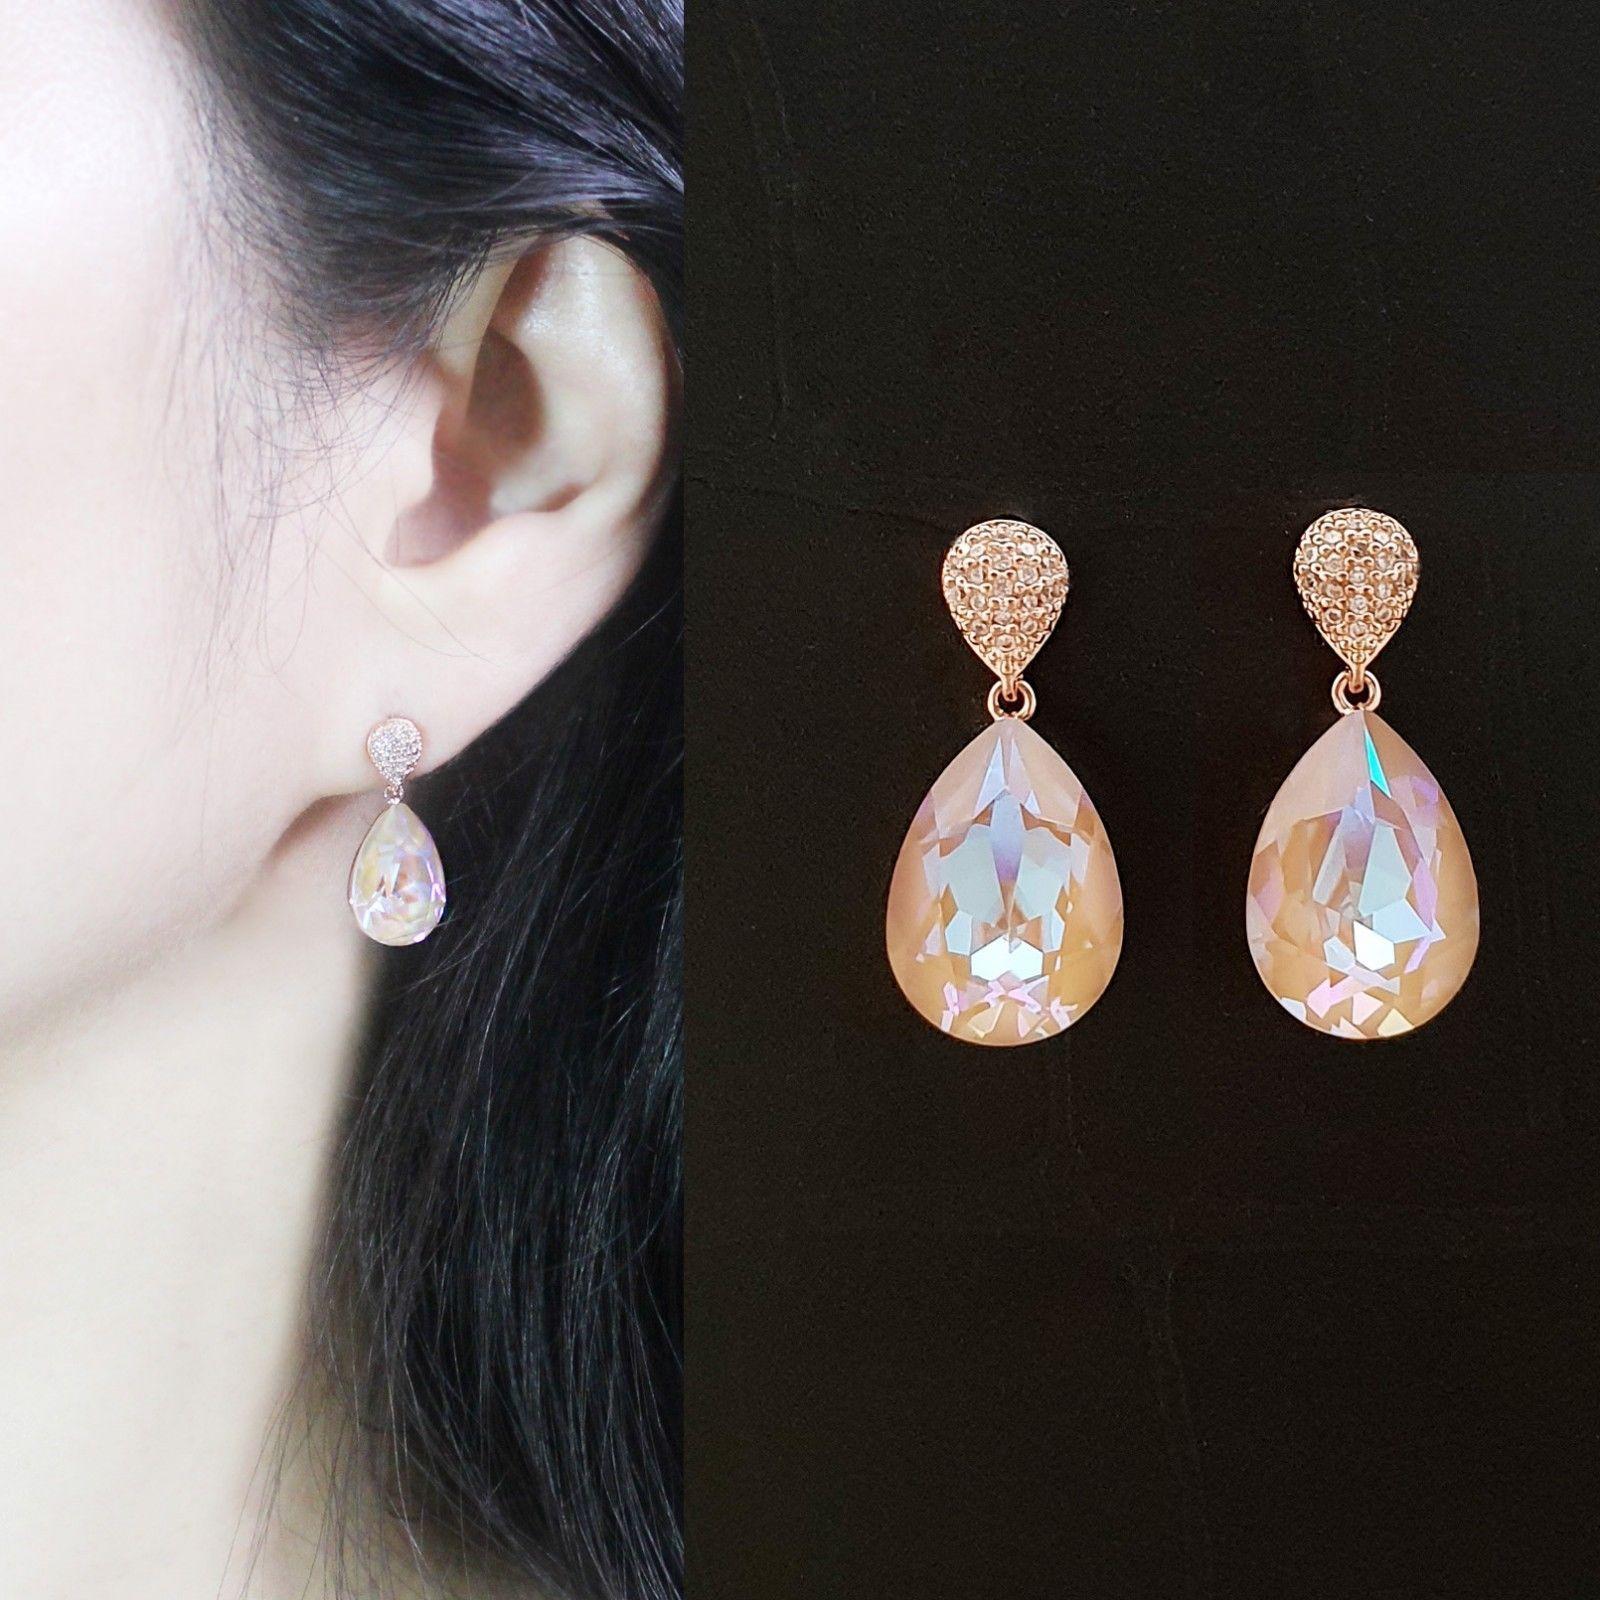 Water Drop Aurora Borealis Made With Swarovski Stone Dangle Earrings 925 Silver